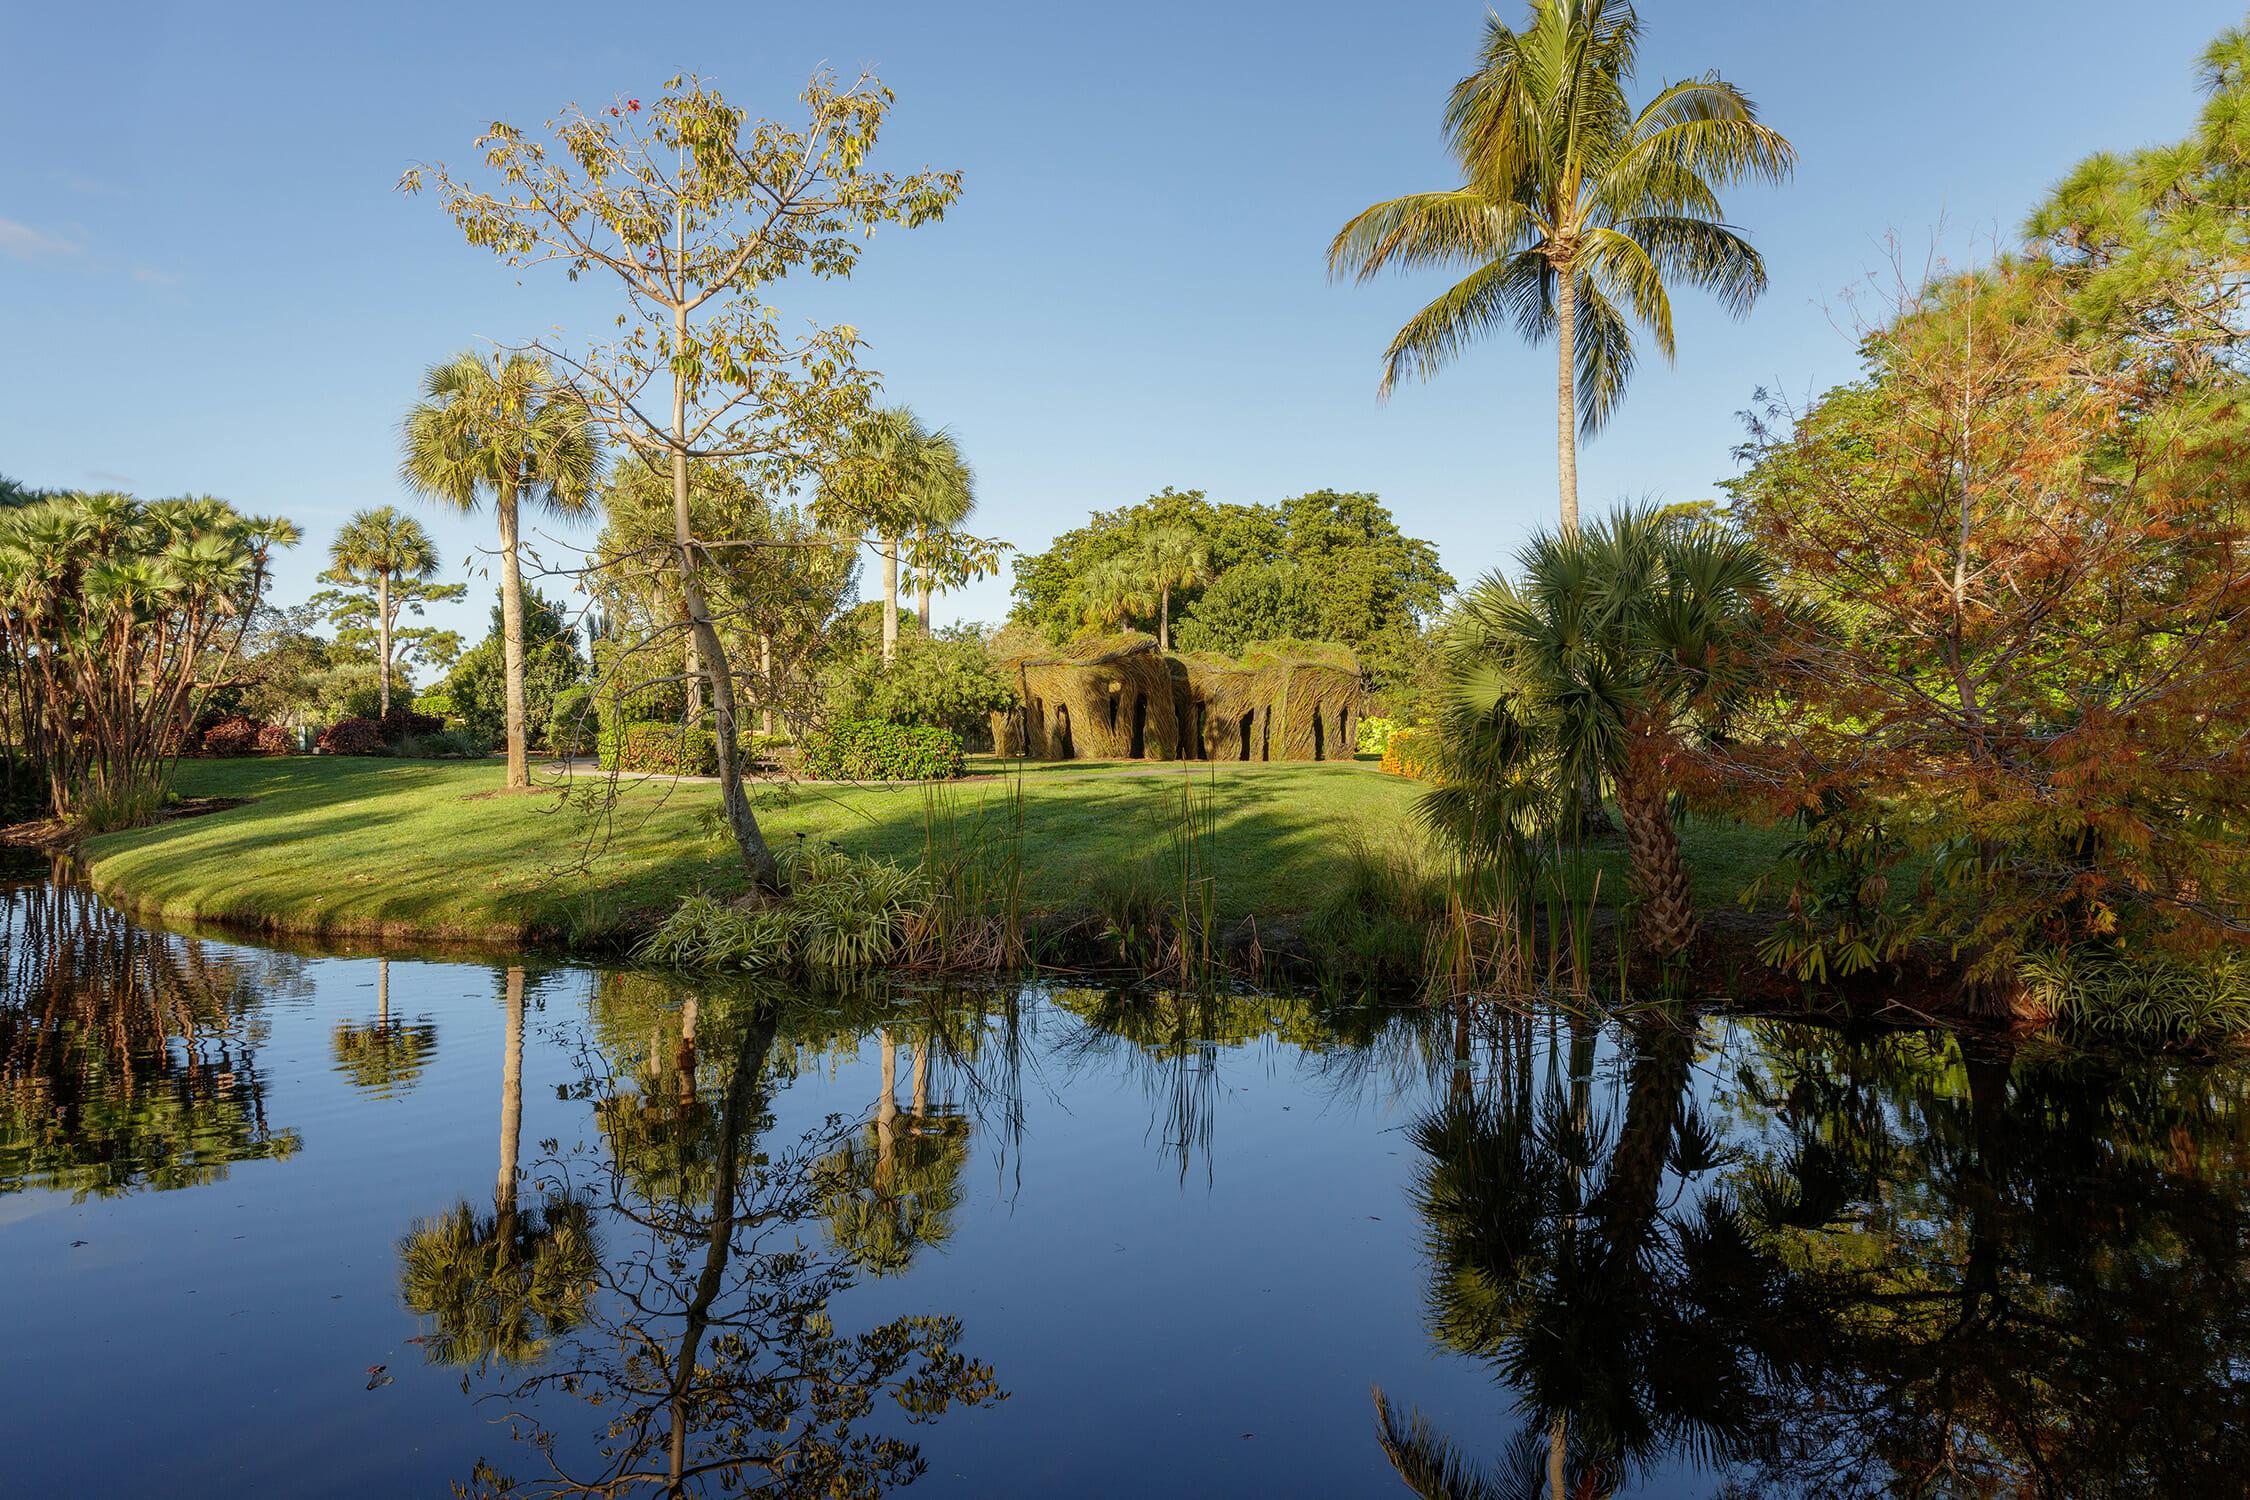 Mounts Botanical Garden Extends Open Hours Most Days and Weekends